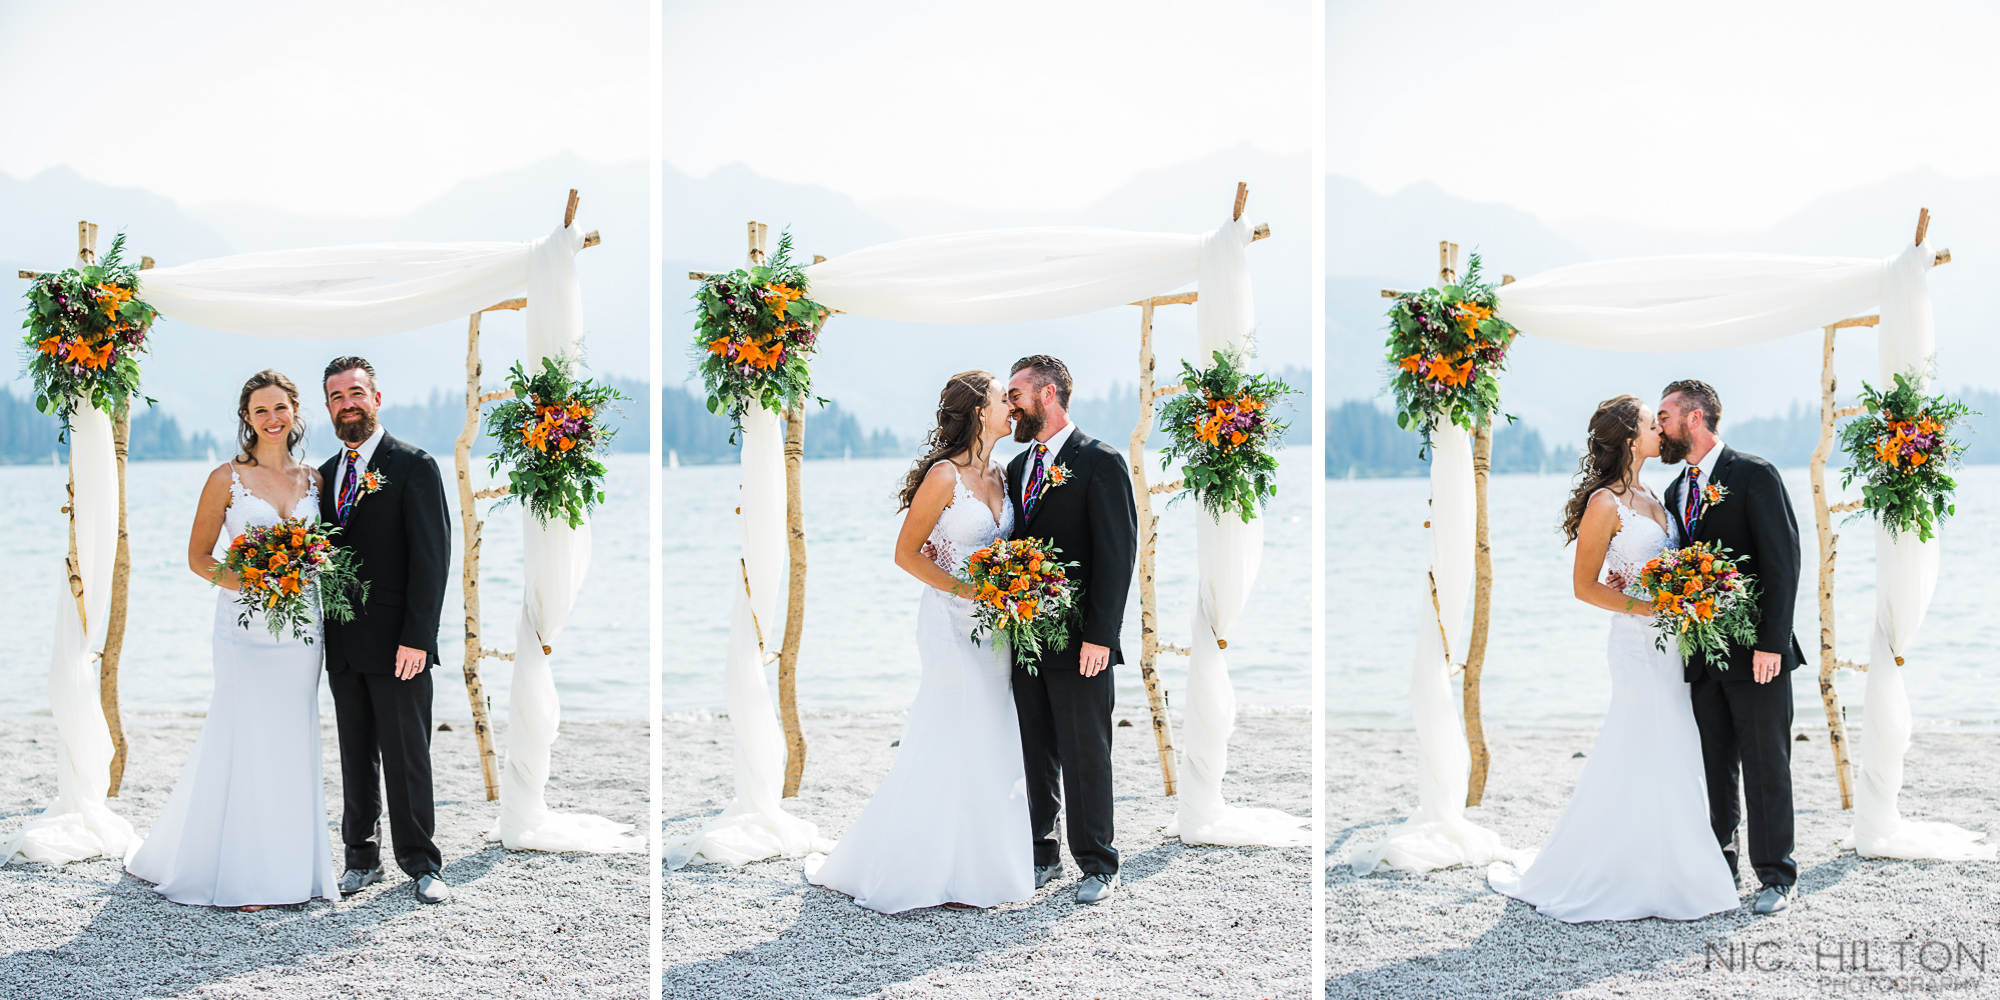 June-lake-wedding-photography-bride-and-groom.jpg